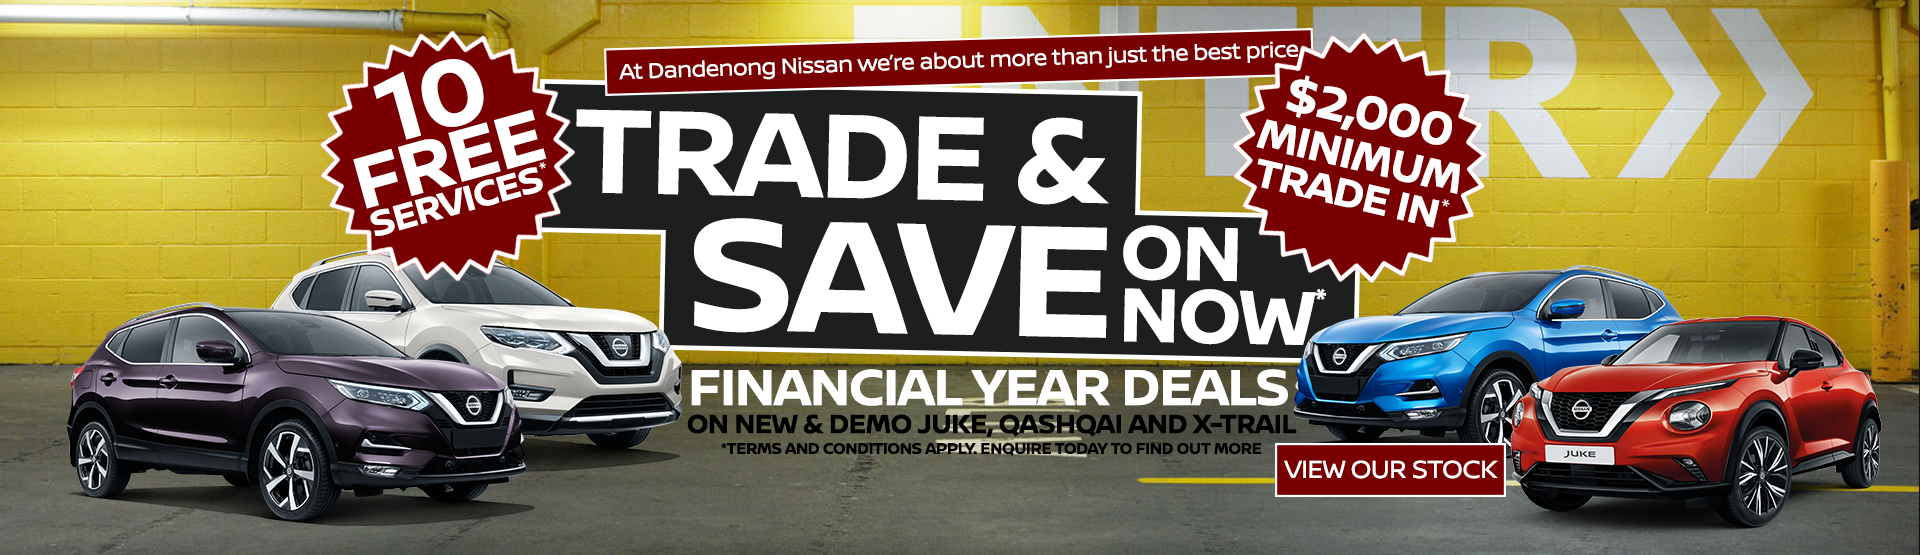 Passenger Trade & Save